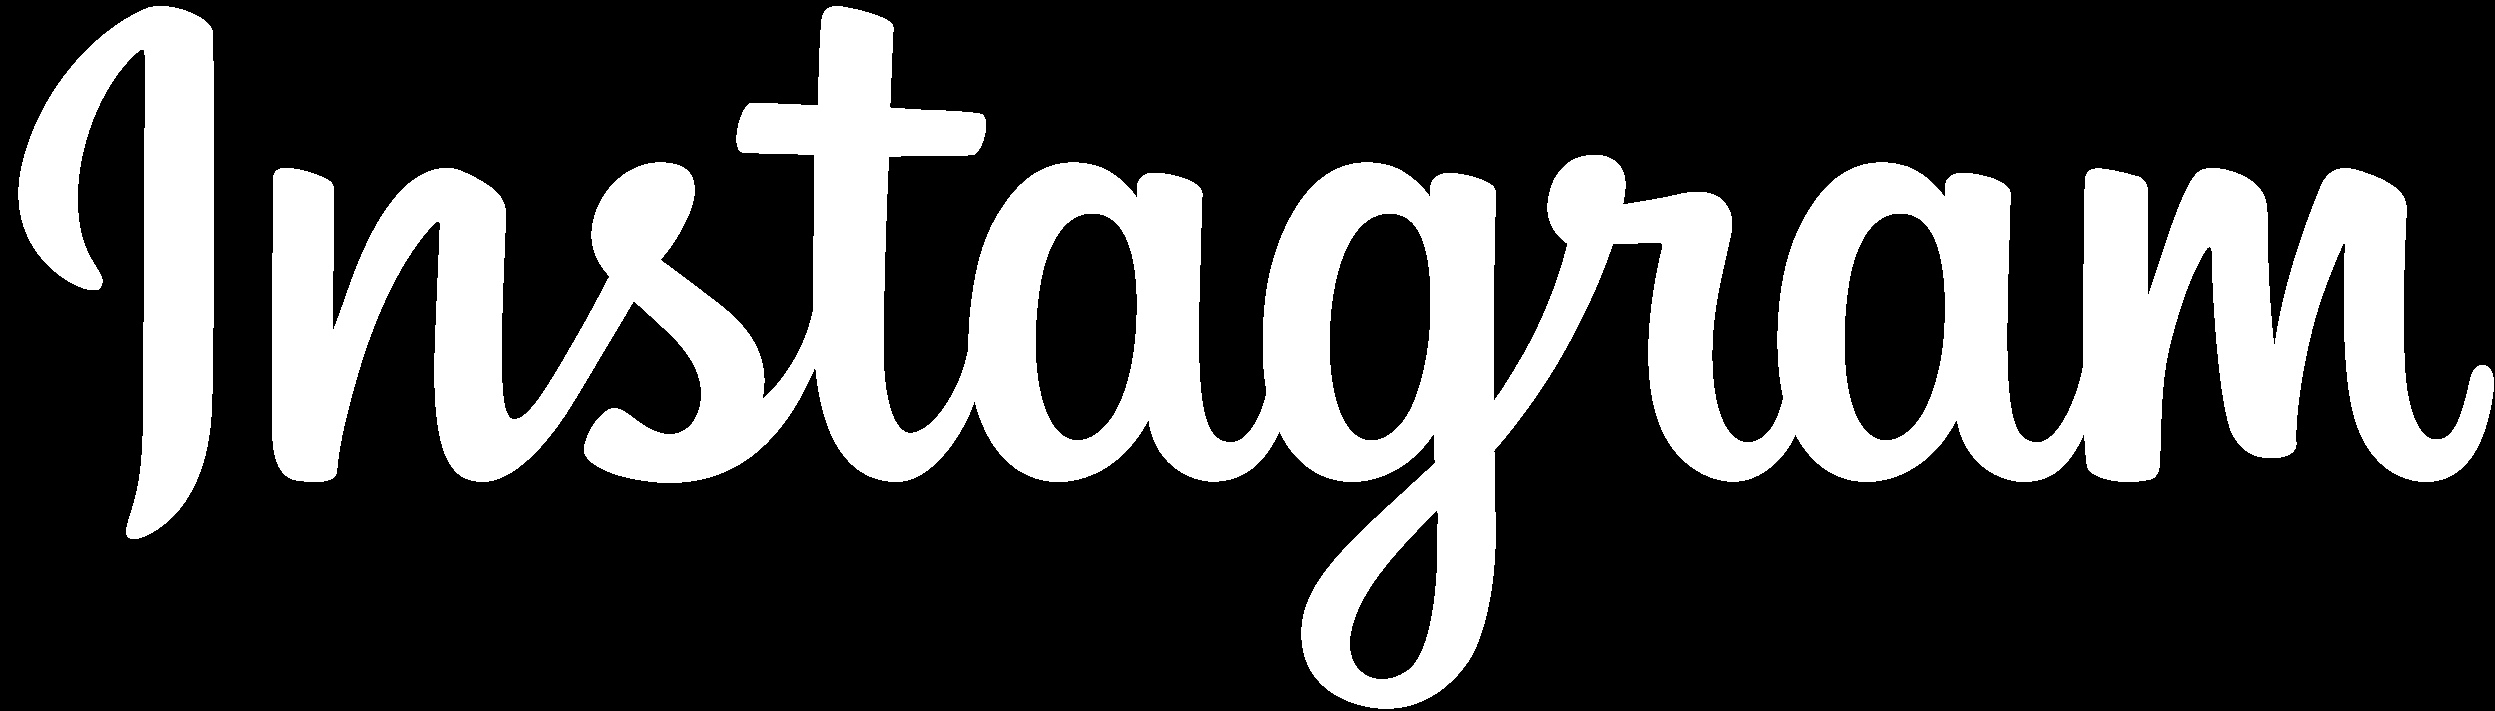 Black and white instagram Logos.